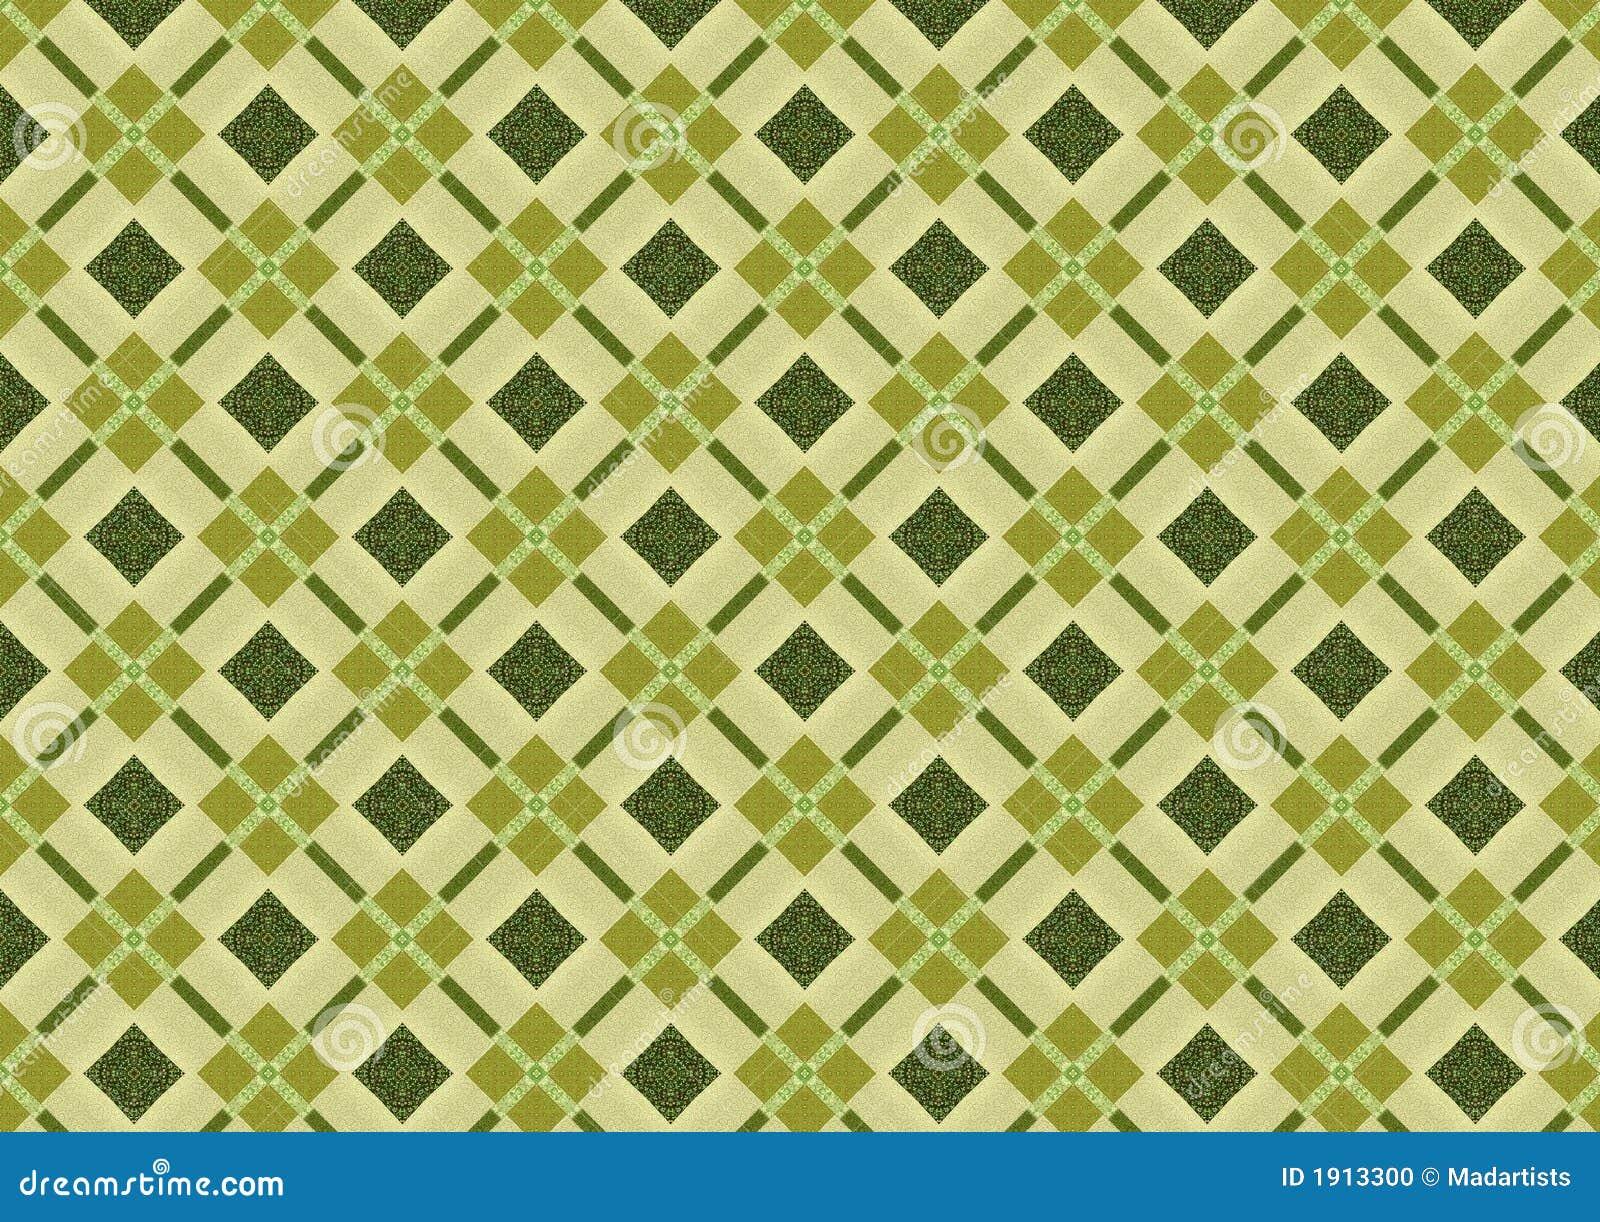 Khaki Green Diamond Pattern